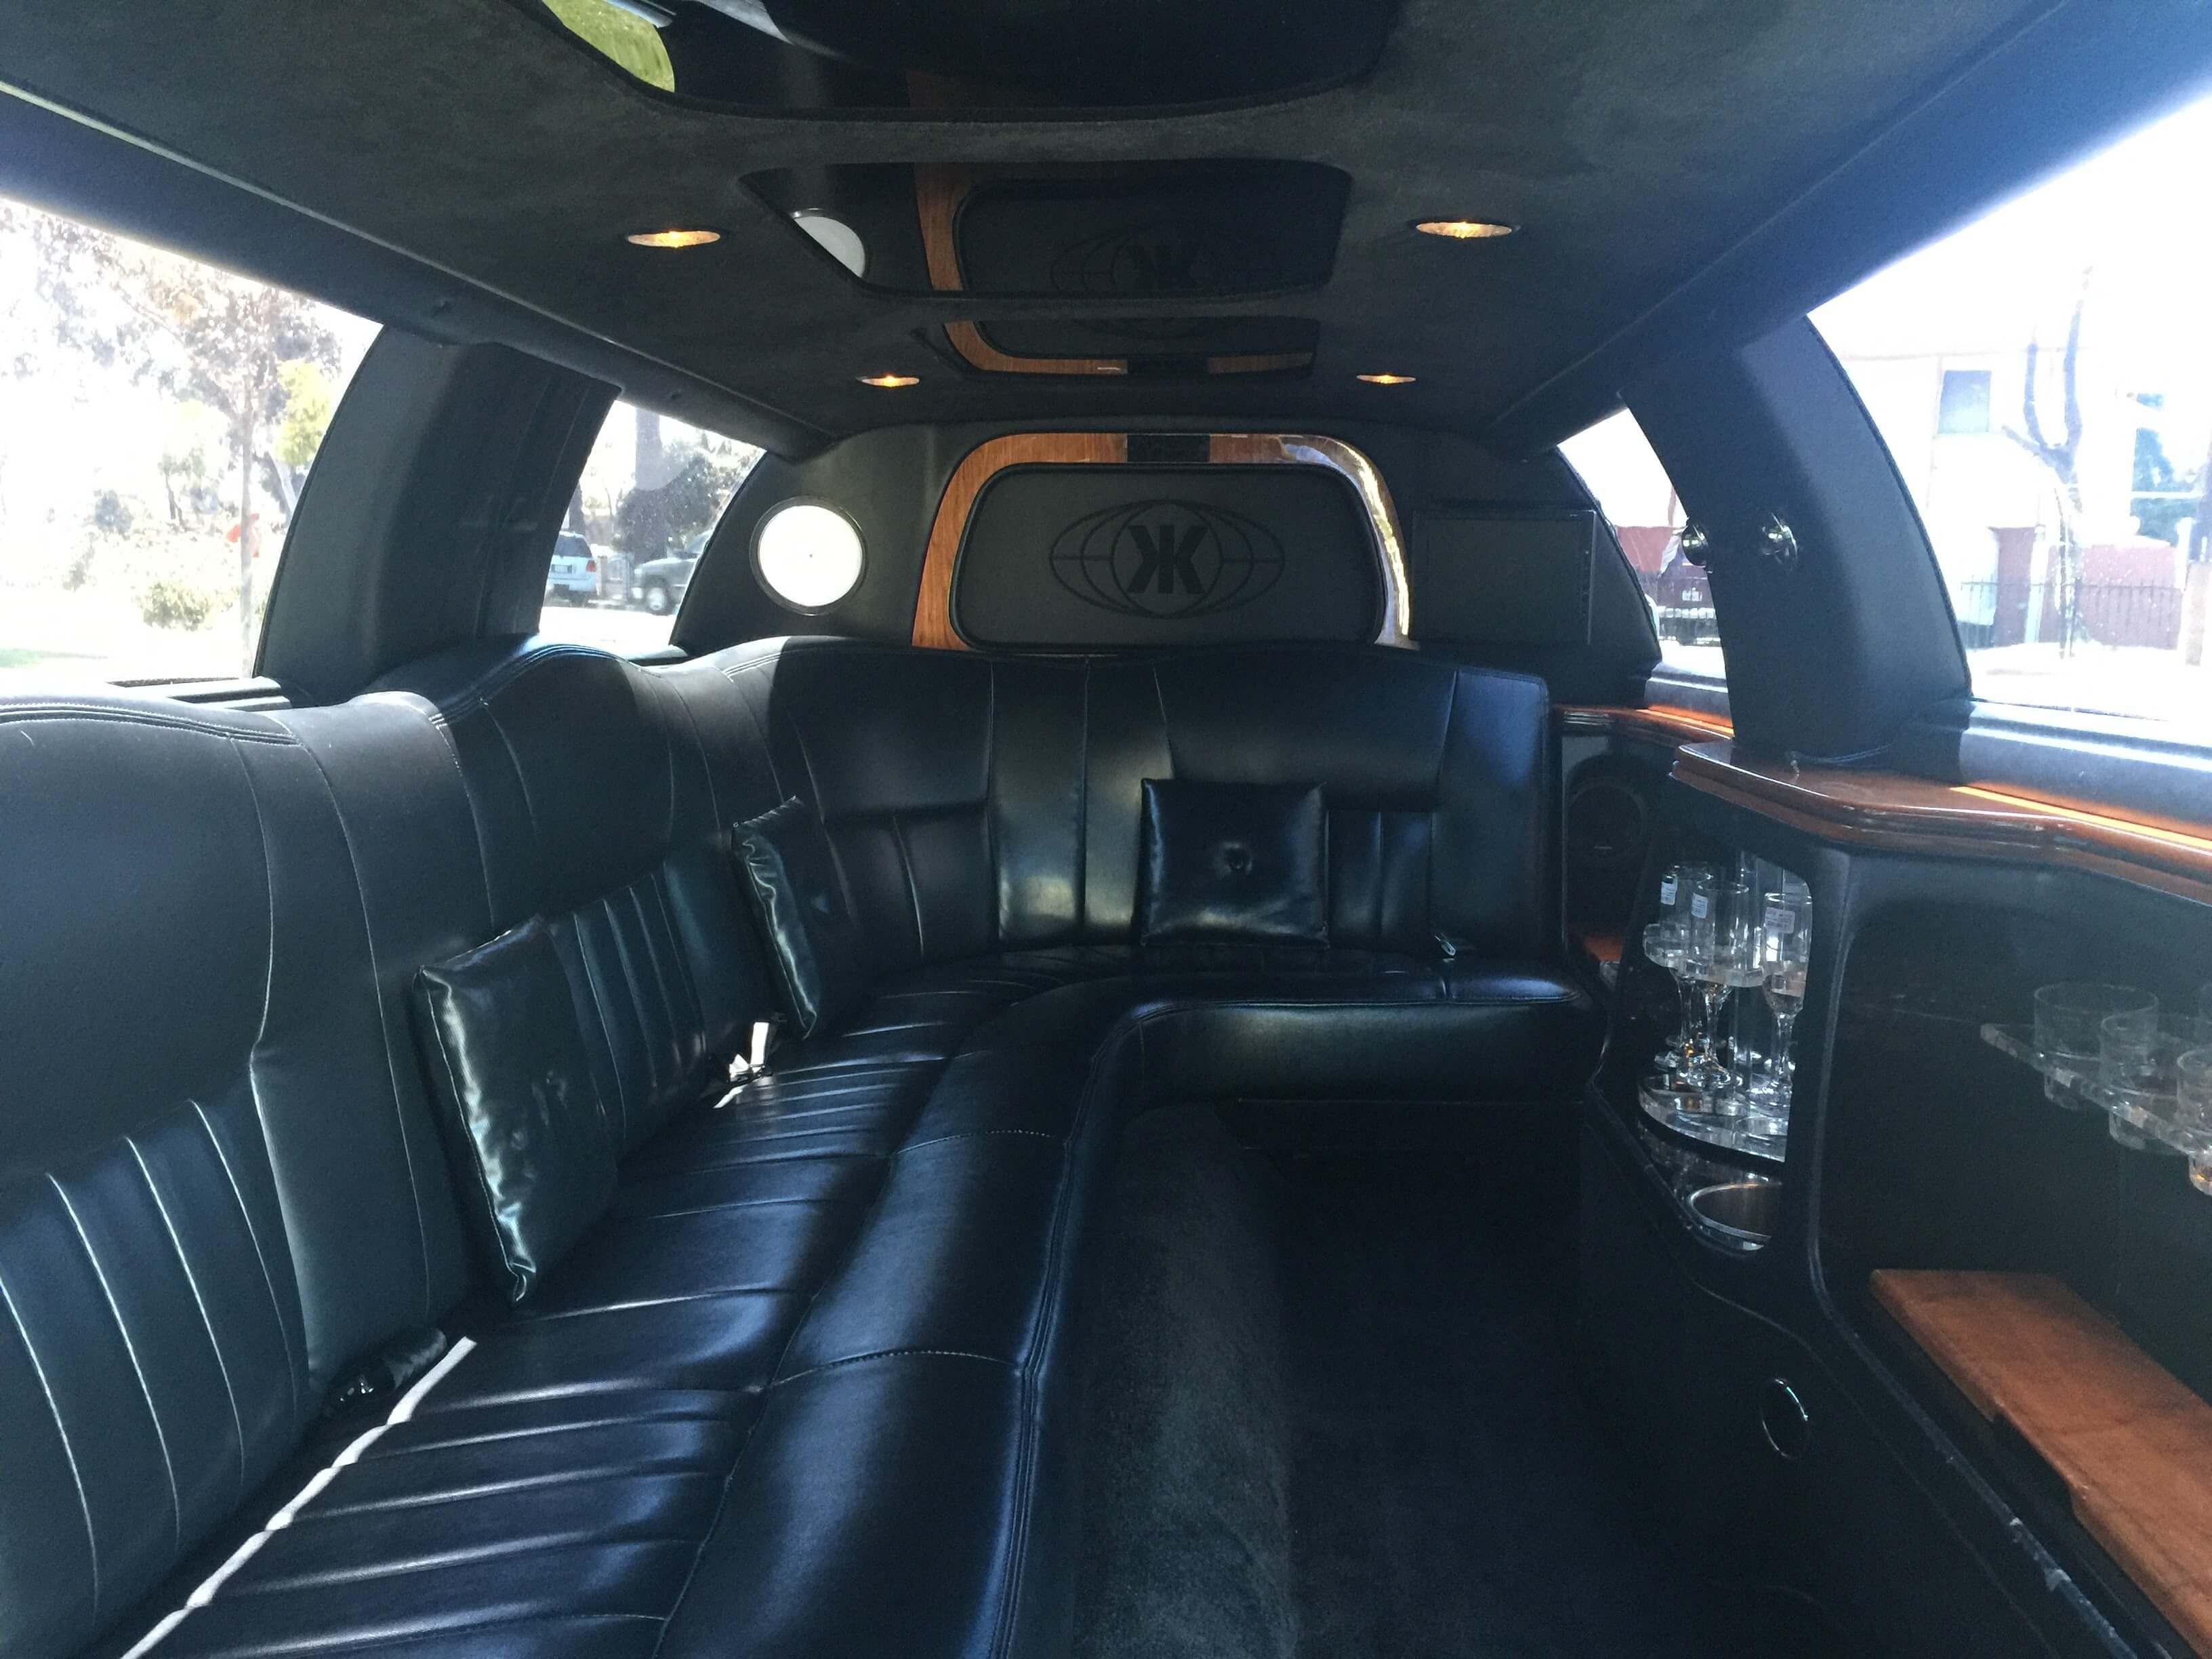 lincoln stretch limo interior. Black Bedroom Furniture Sets. Home Design Ideas